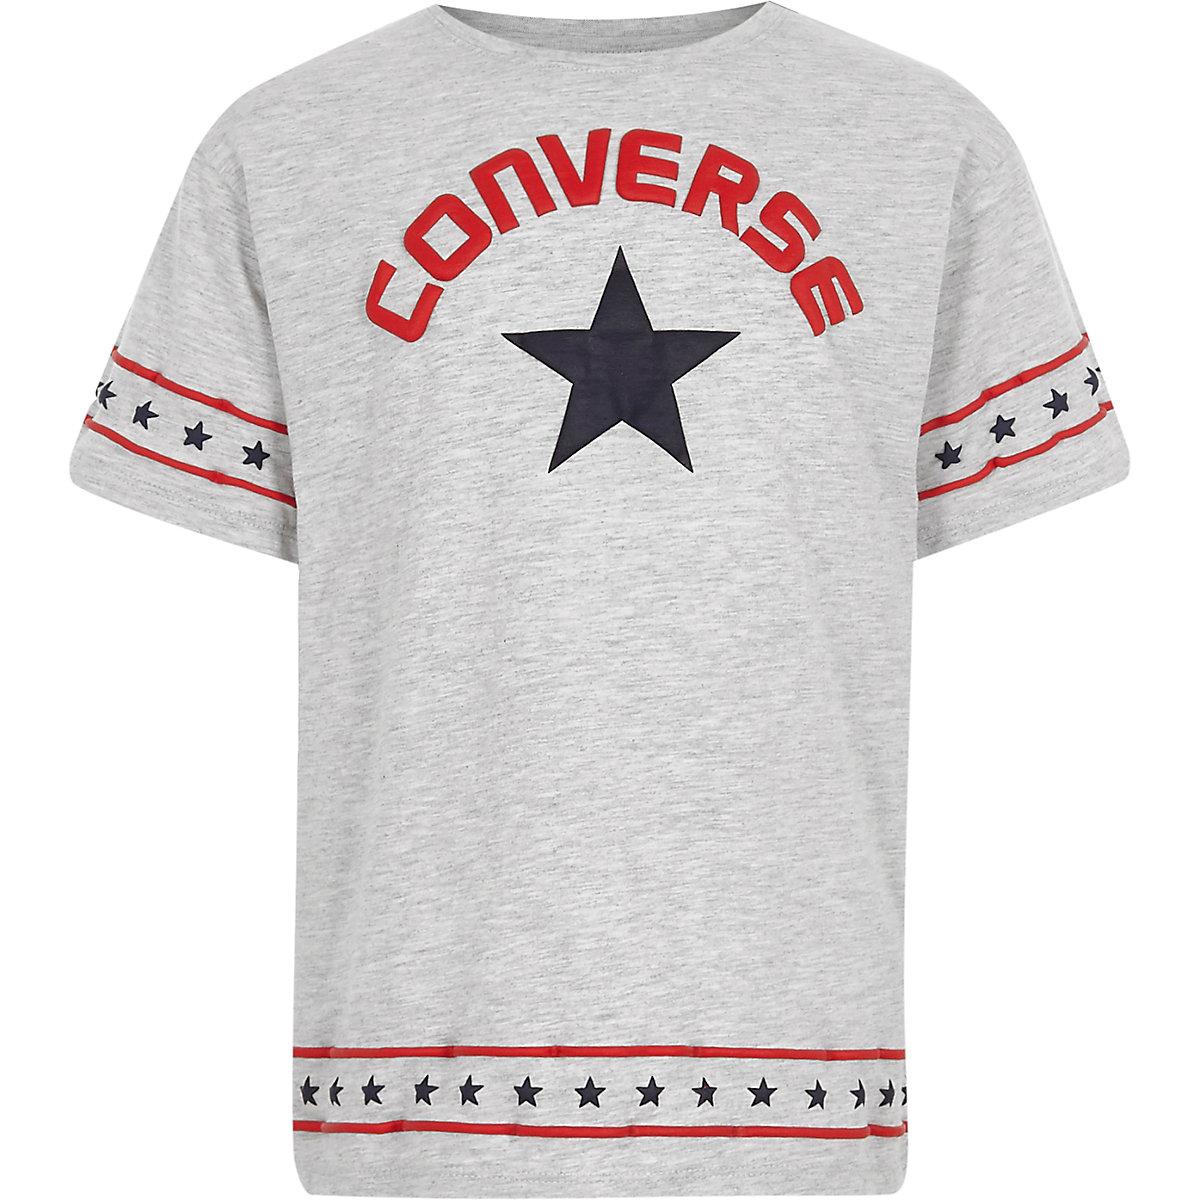 Girls Converse grey star trim T-shirt